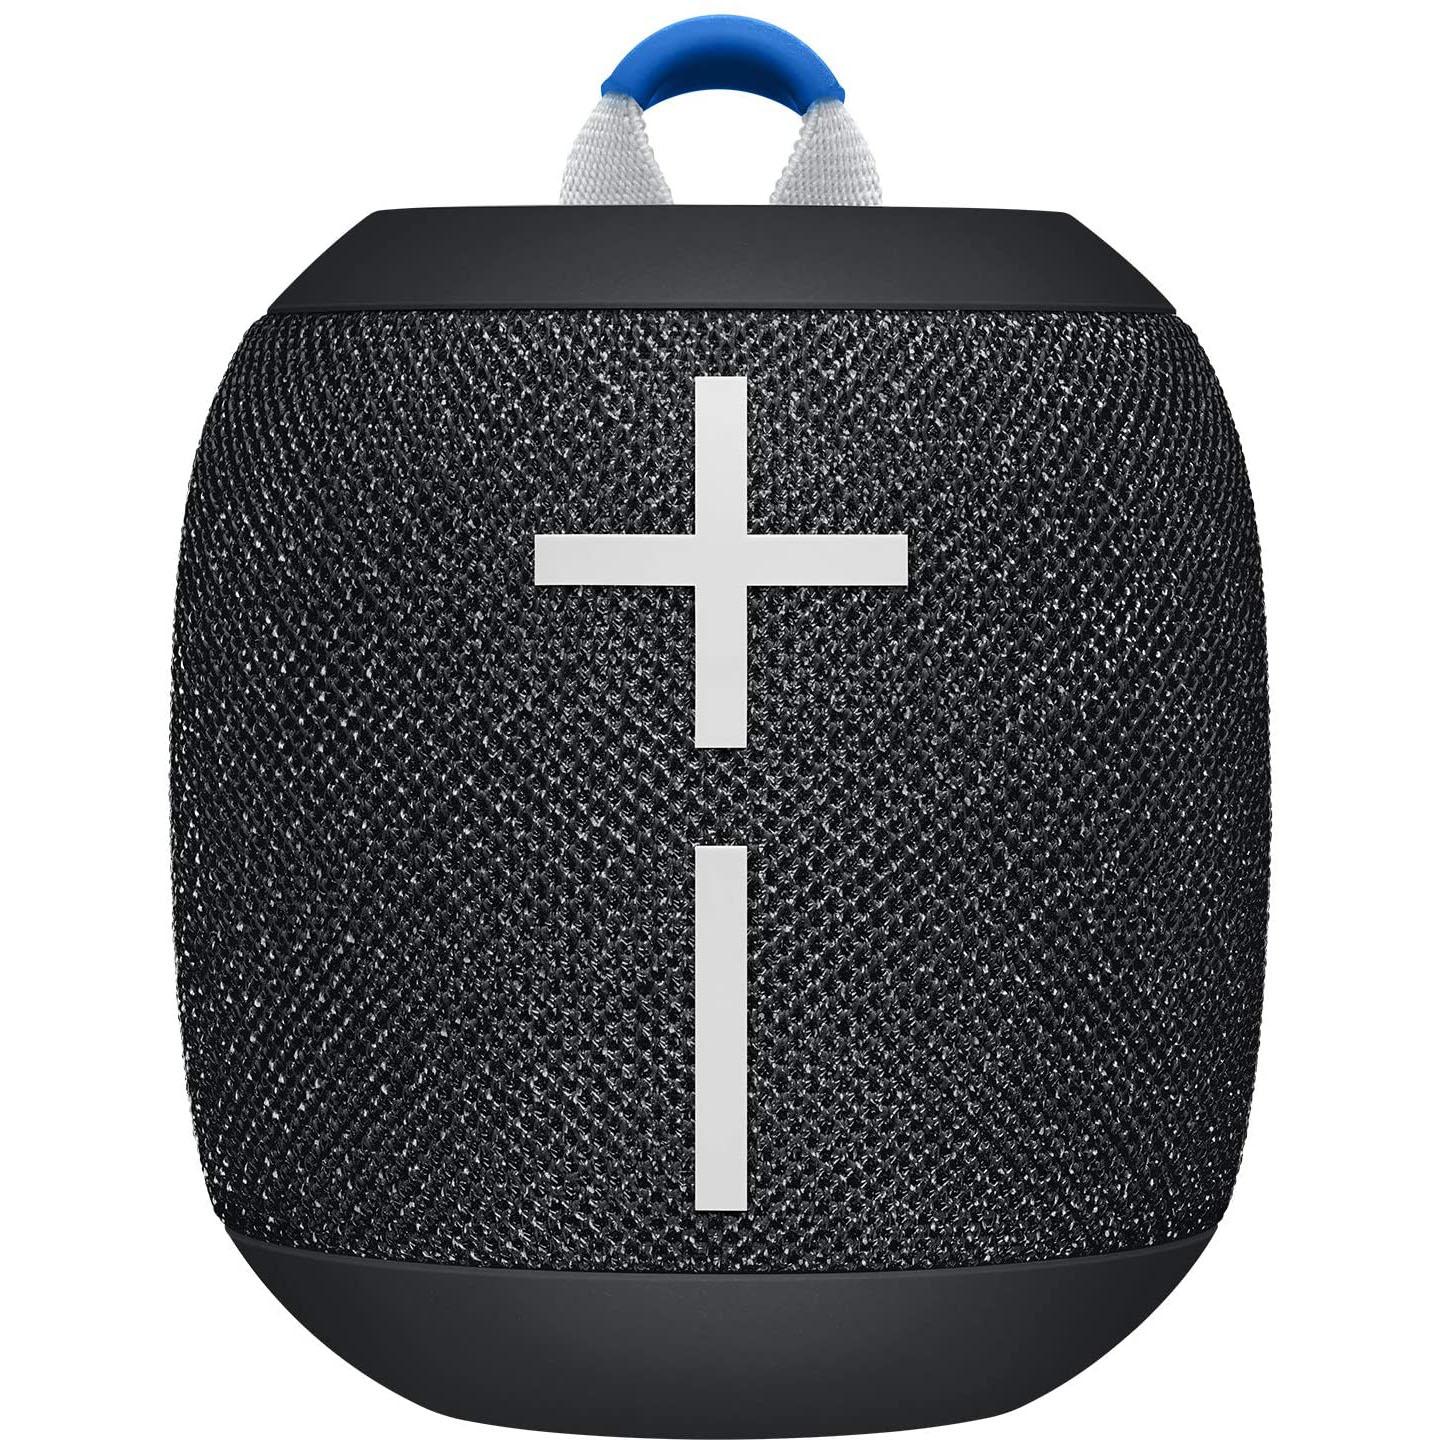 best black friday tech deals 2020 -Ultimate Ears WONDERBOOM 2 Bluetooth speaker